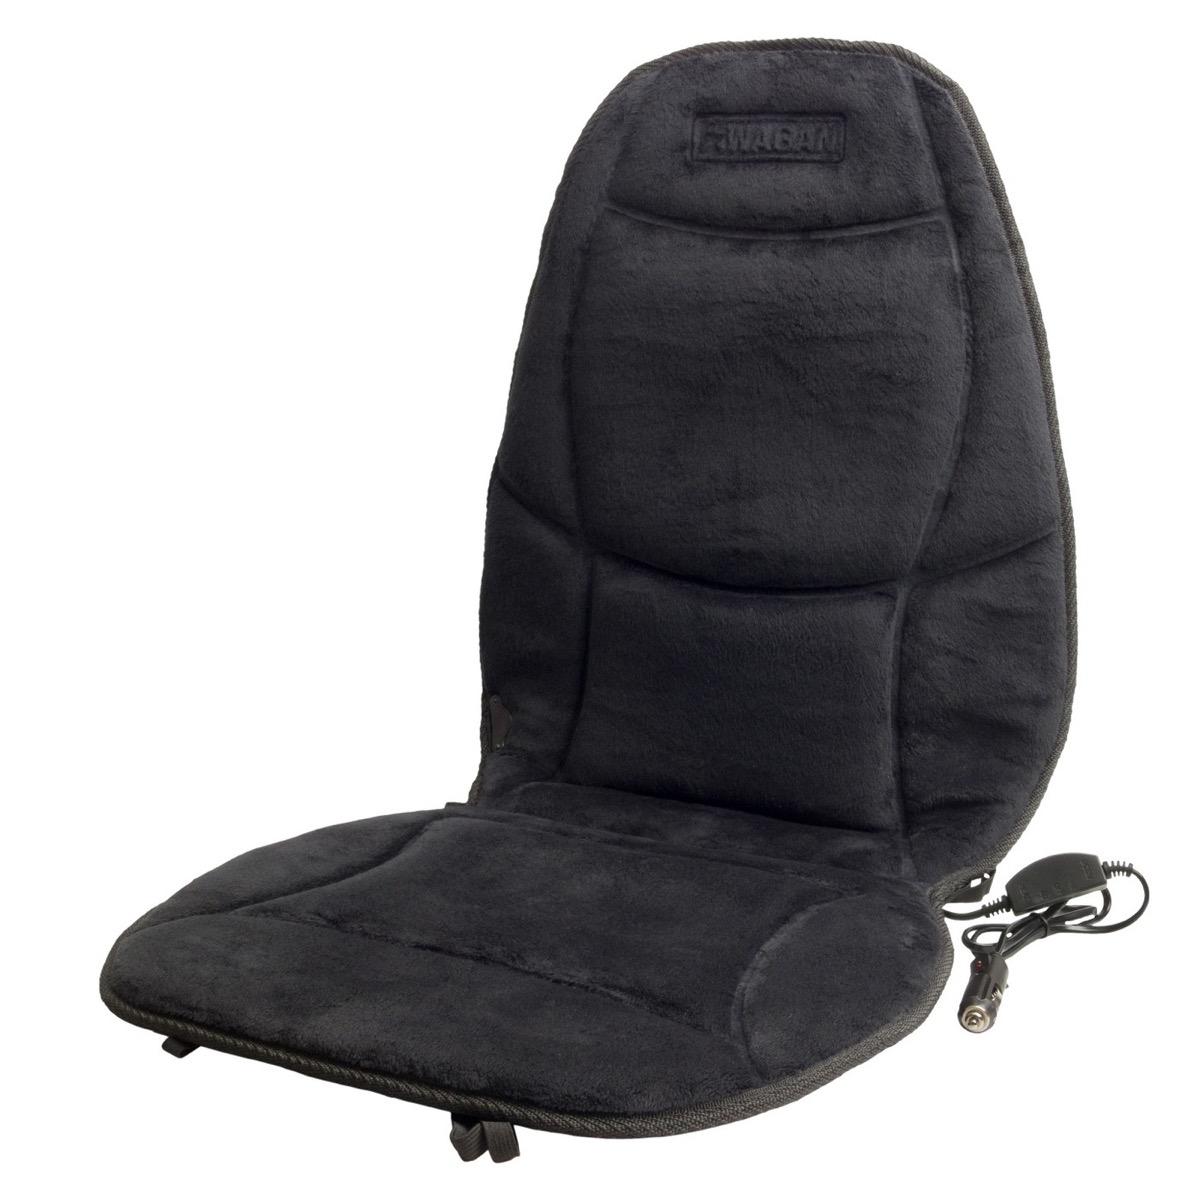 Heated Car Seat Cushion {Target Winter Essentials}